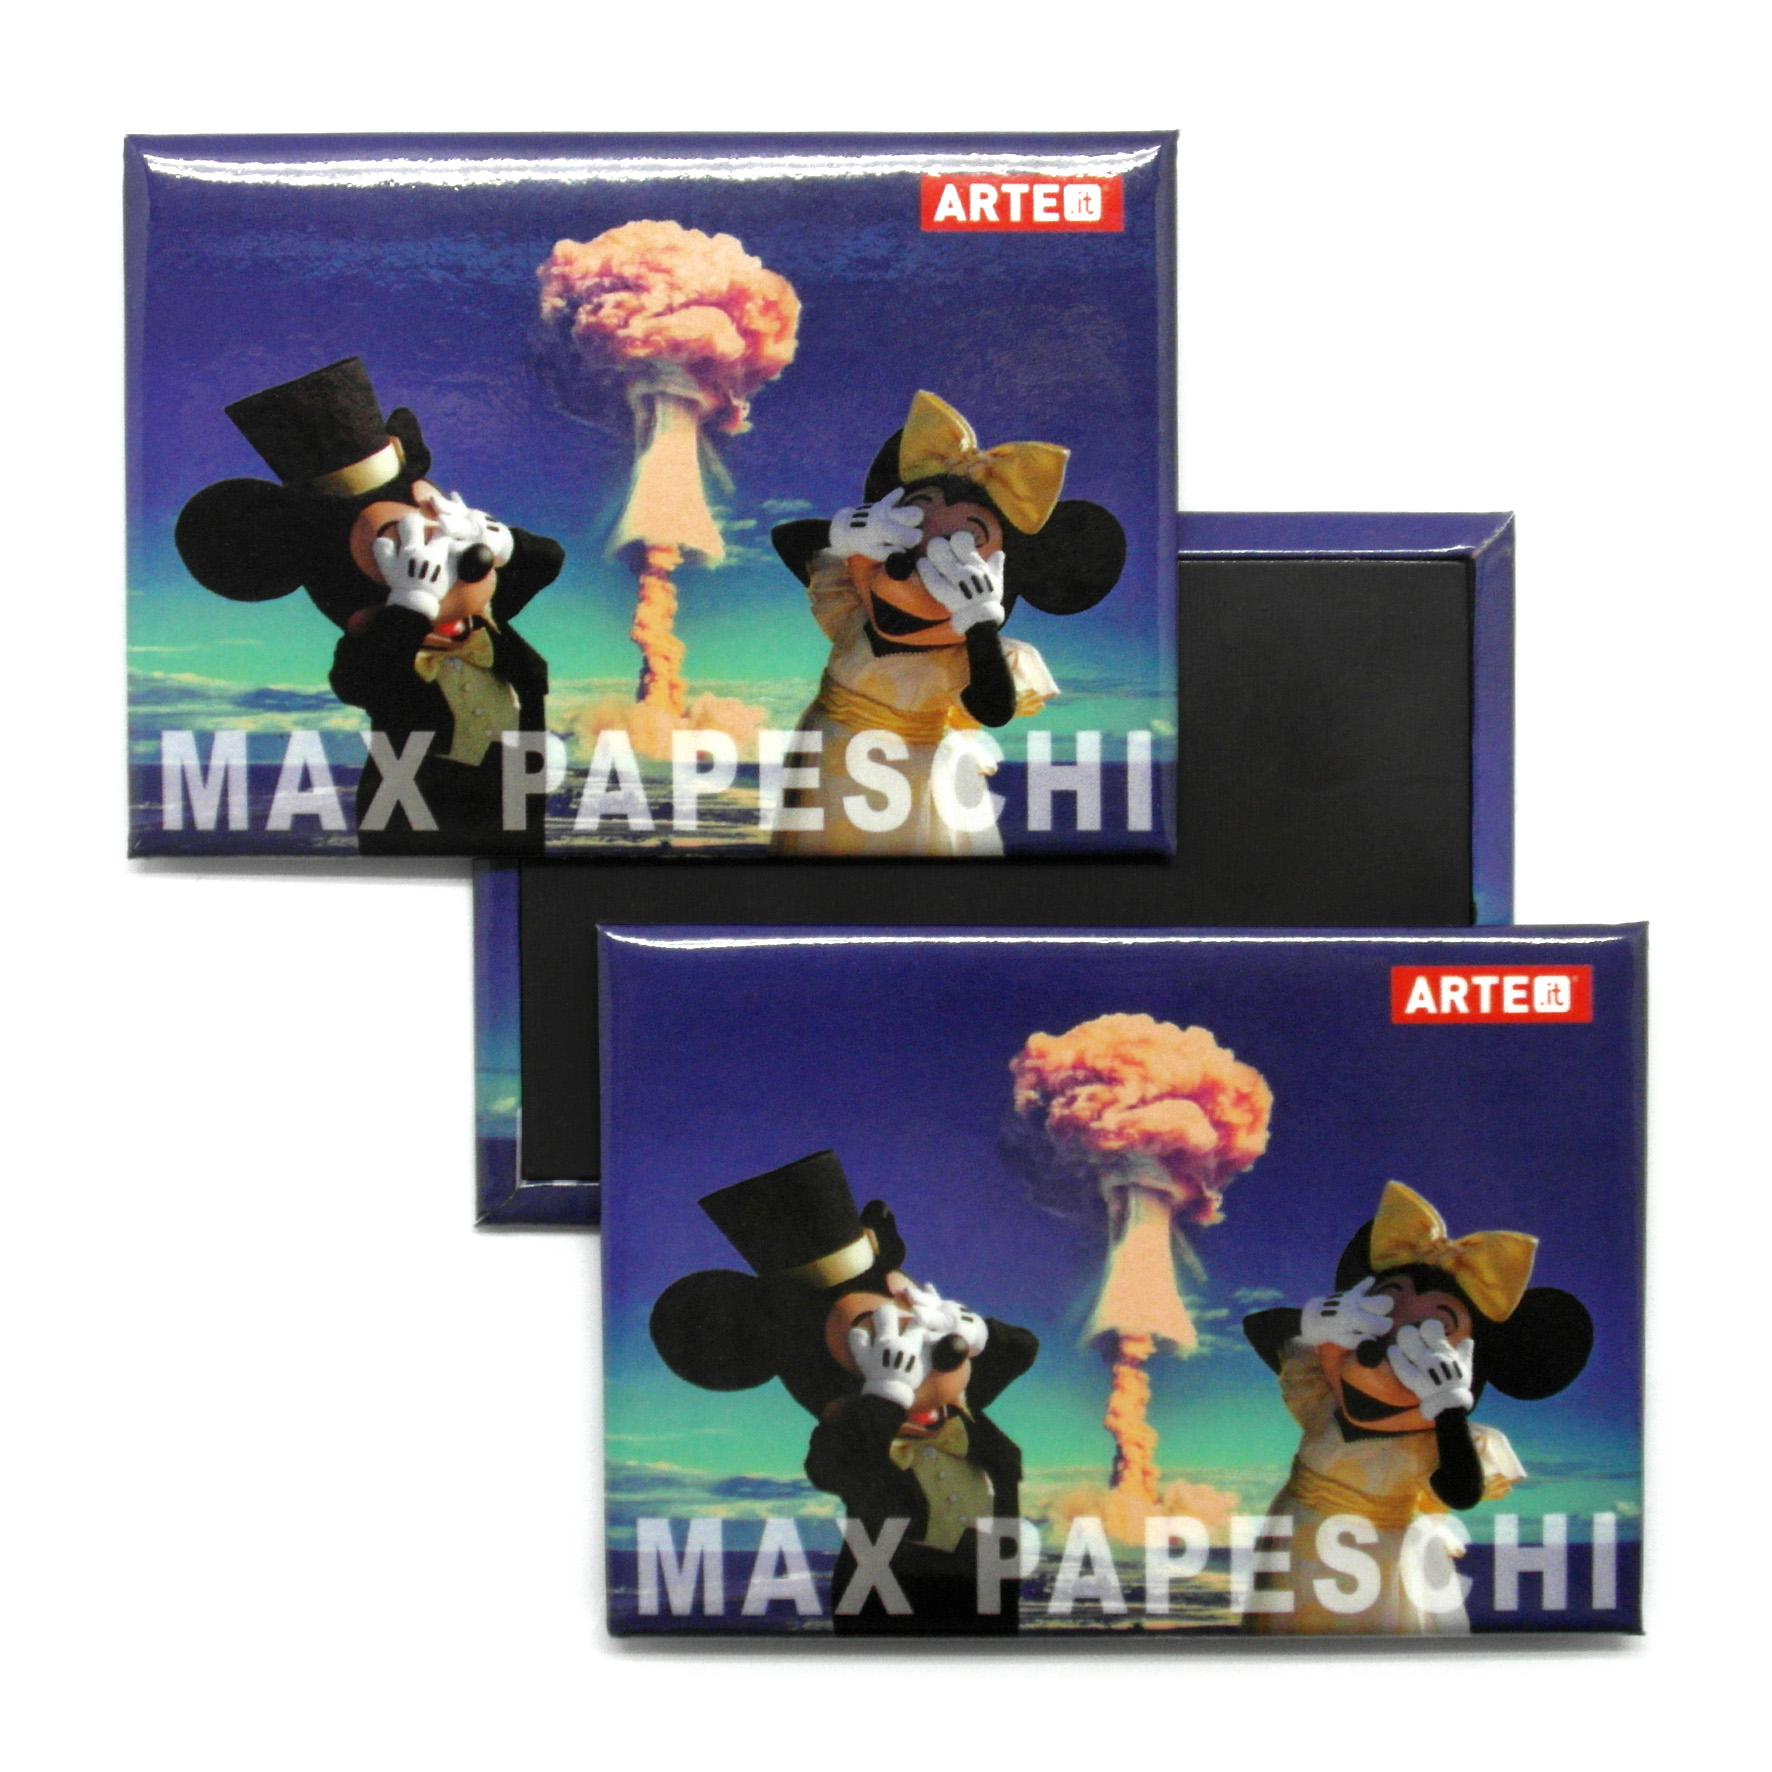 magnete-2-max-papeschi-arteit